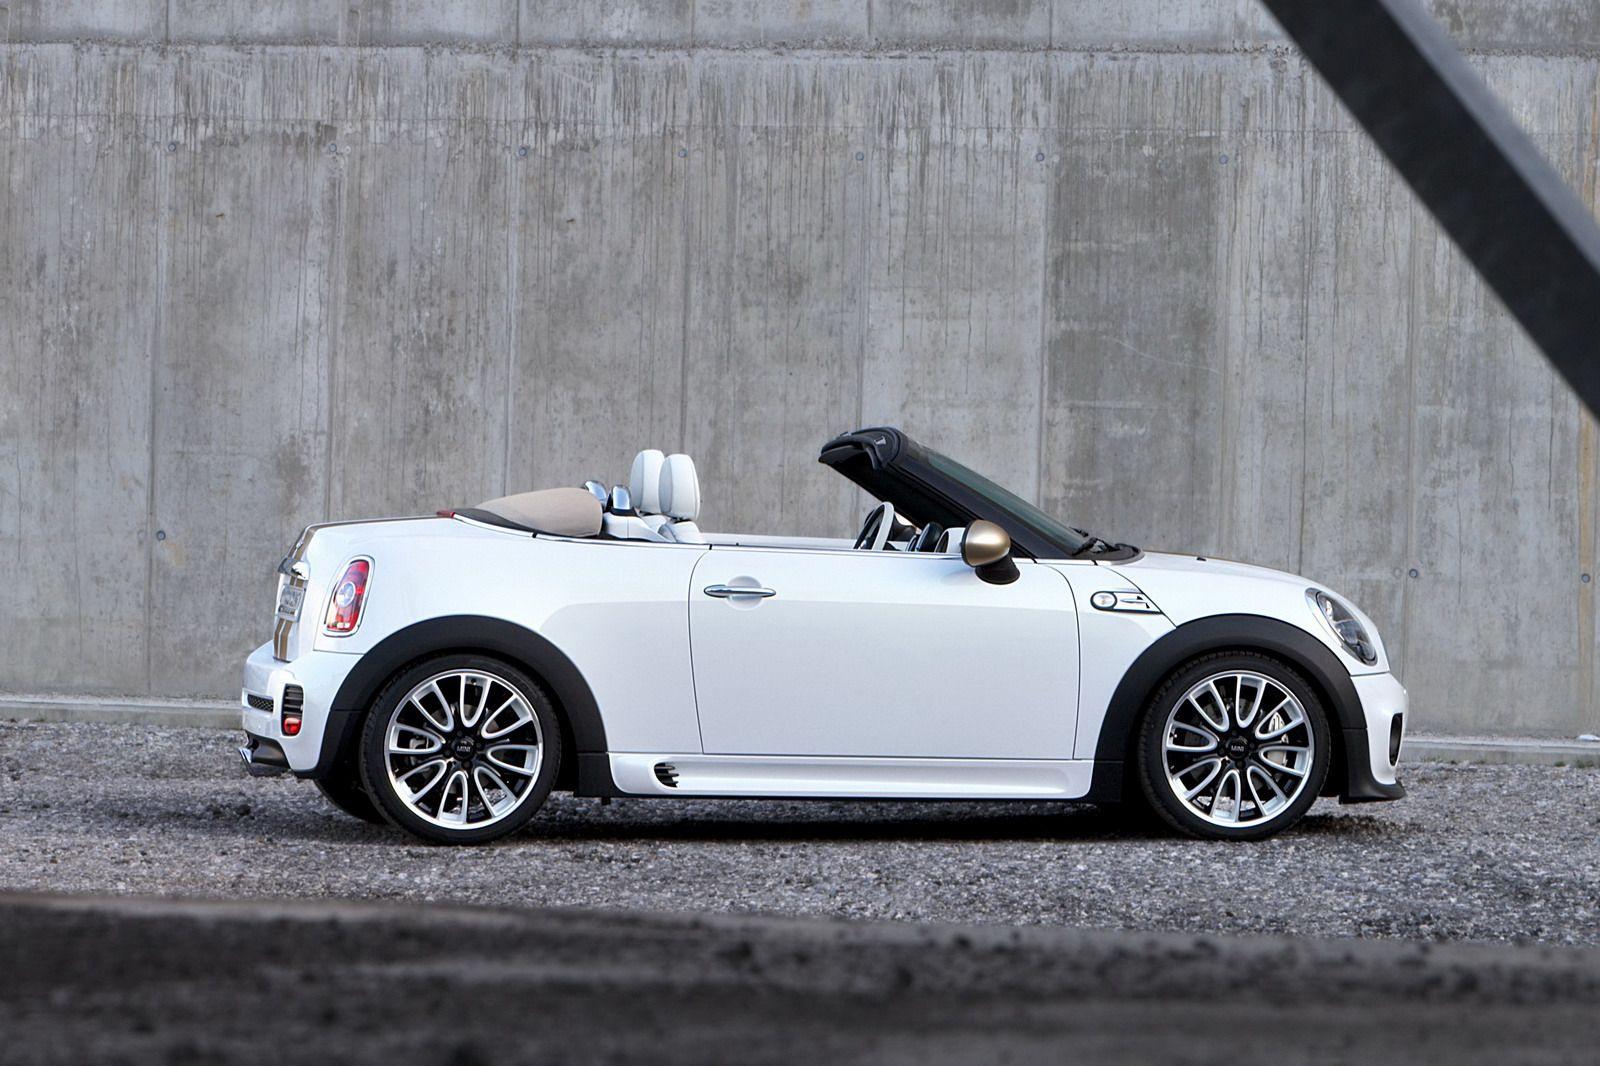 2013 Mini Cooper Roadster in Pepper White with Pepper Pack